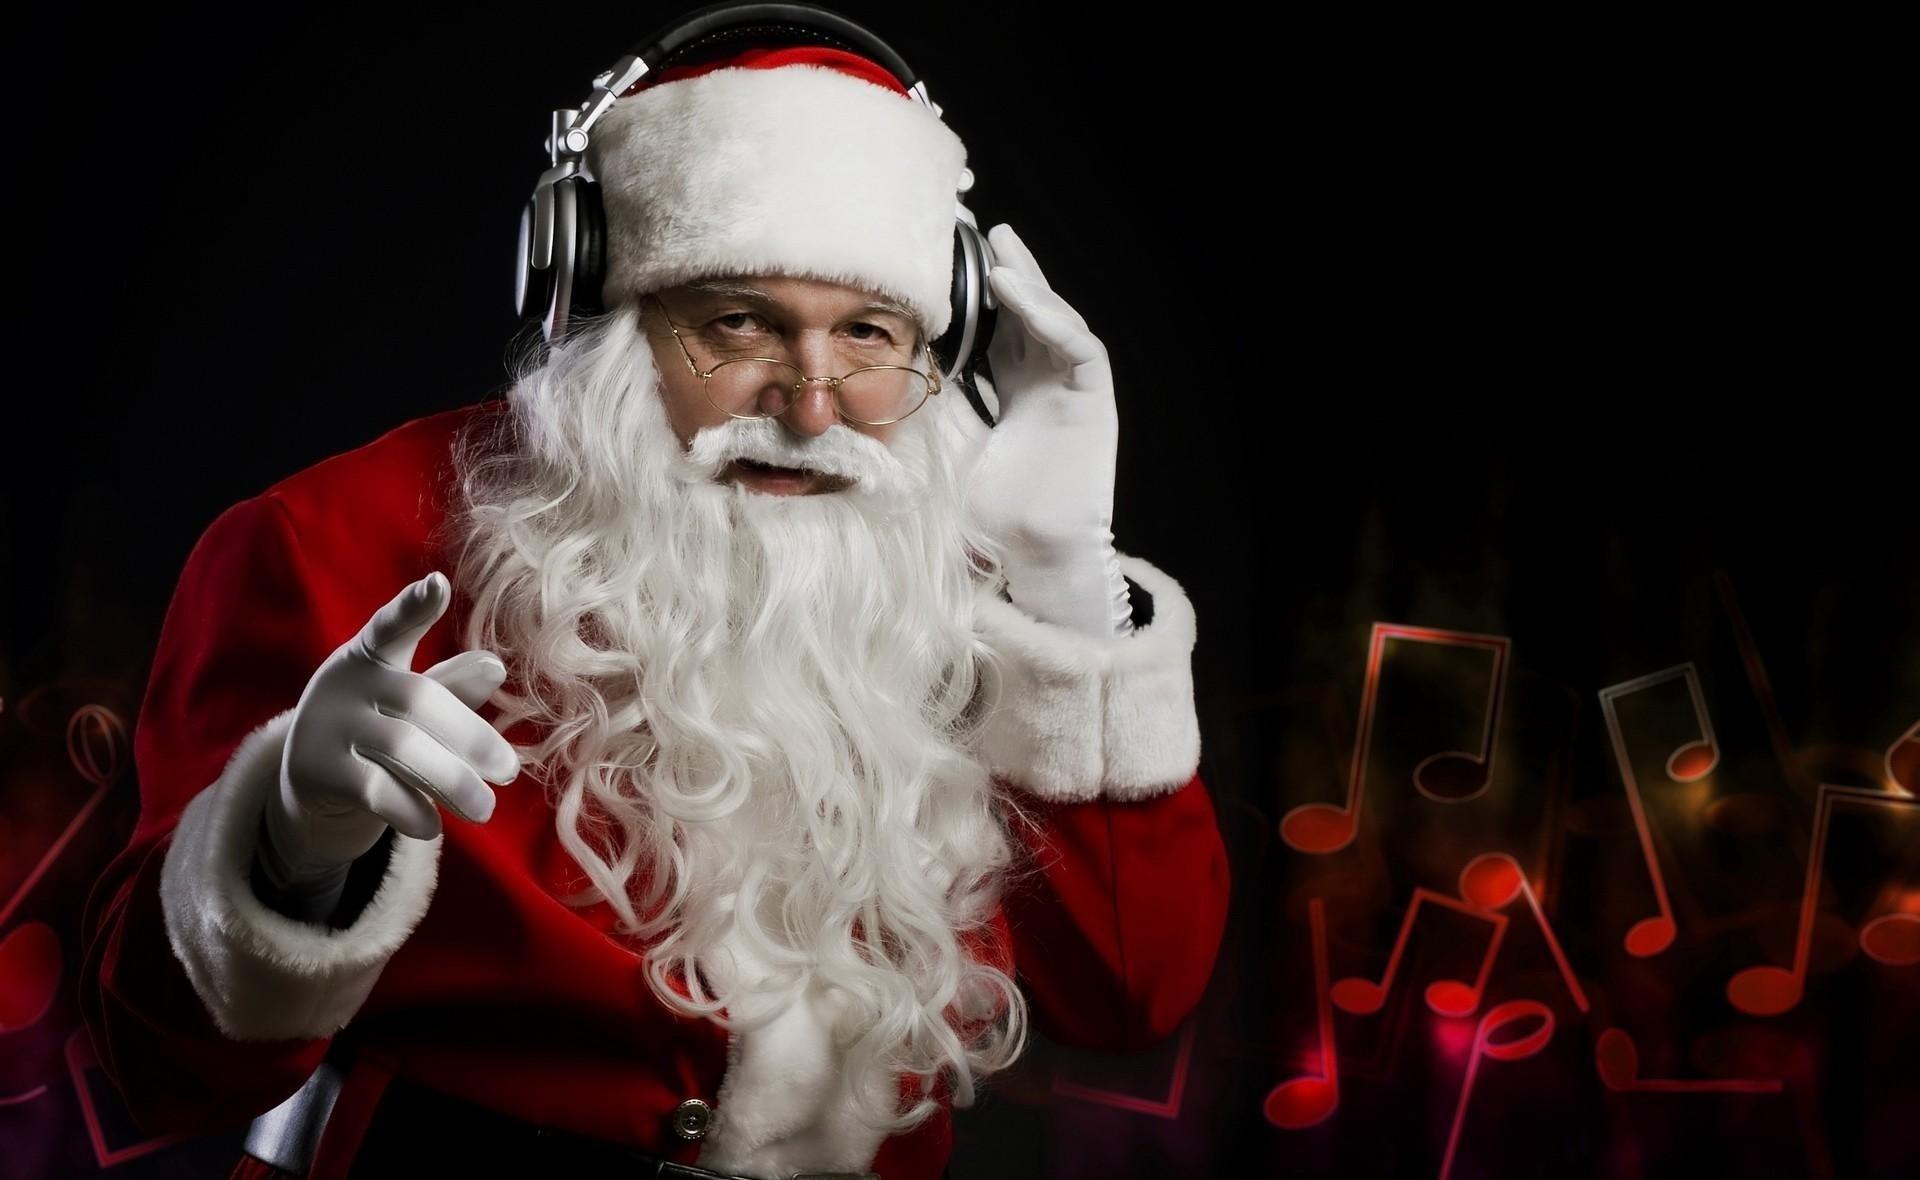 Santa Claus wearing headphones